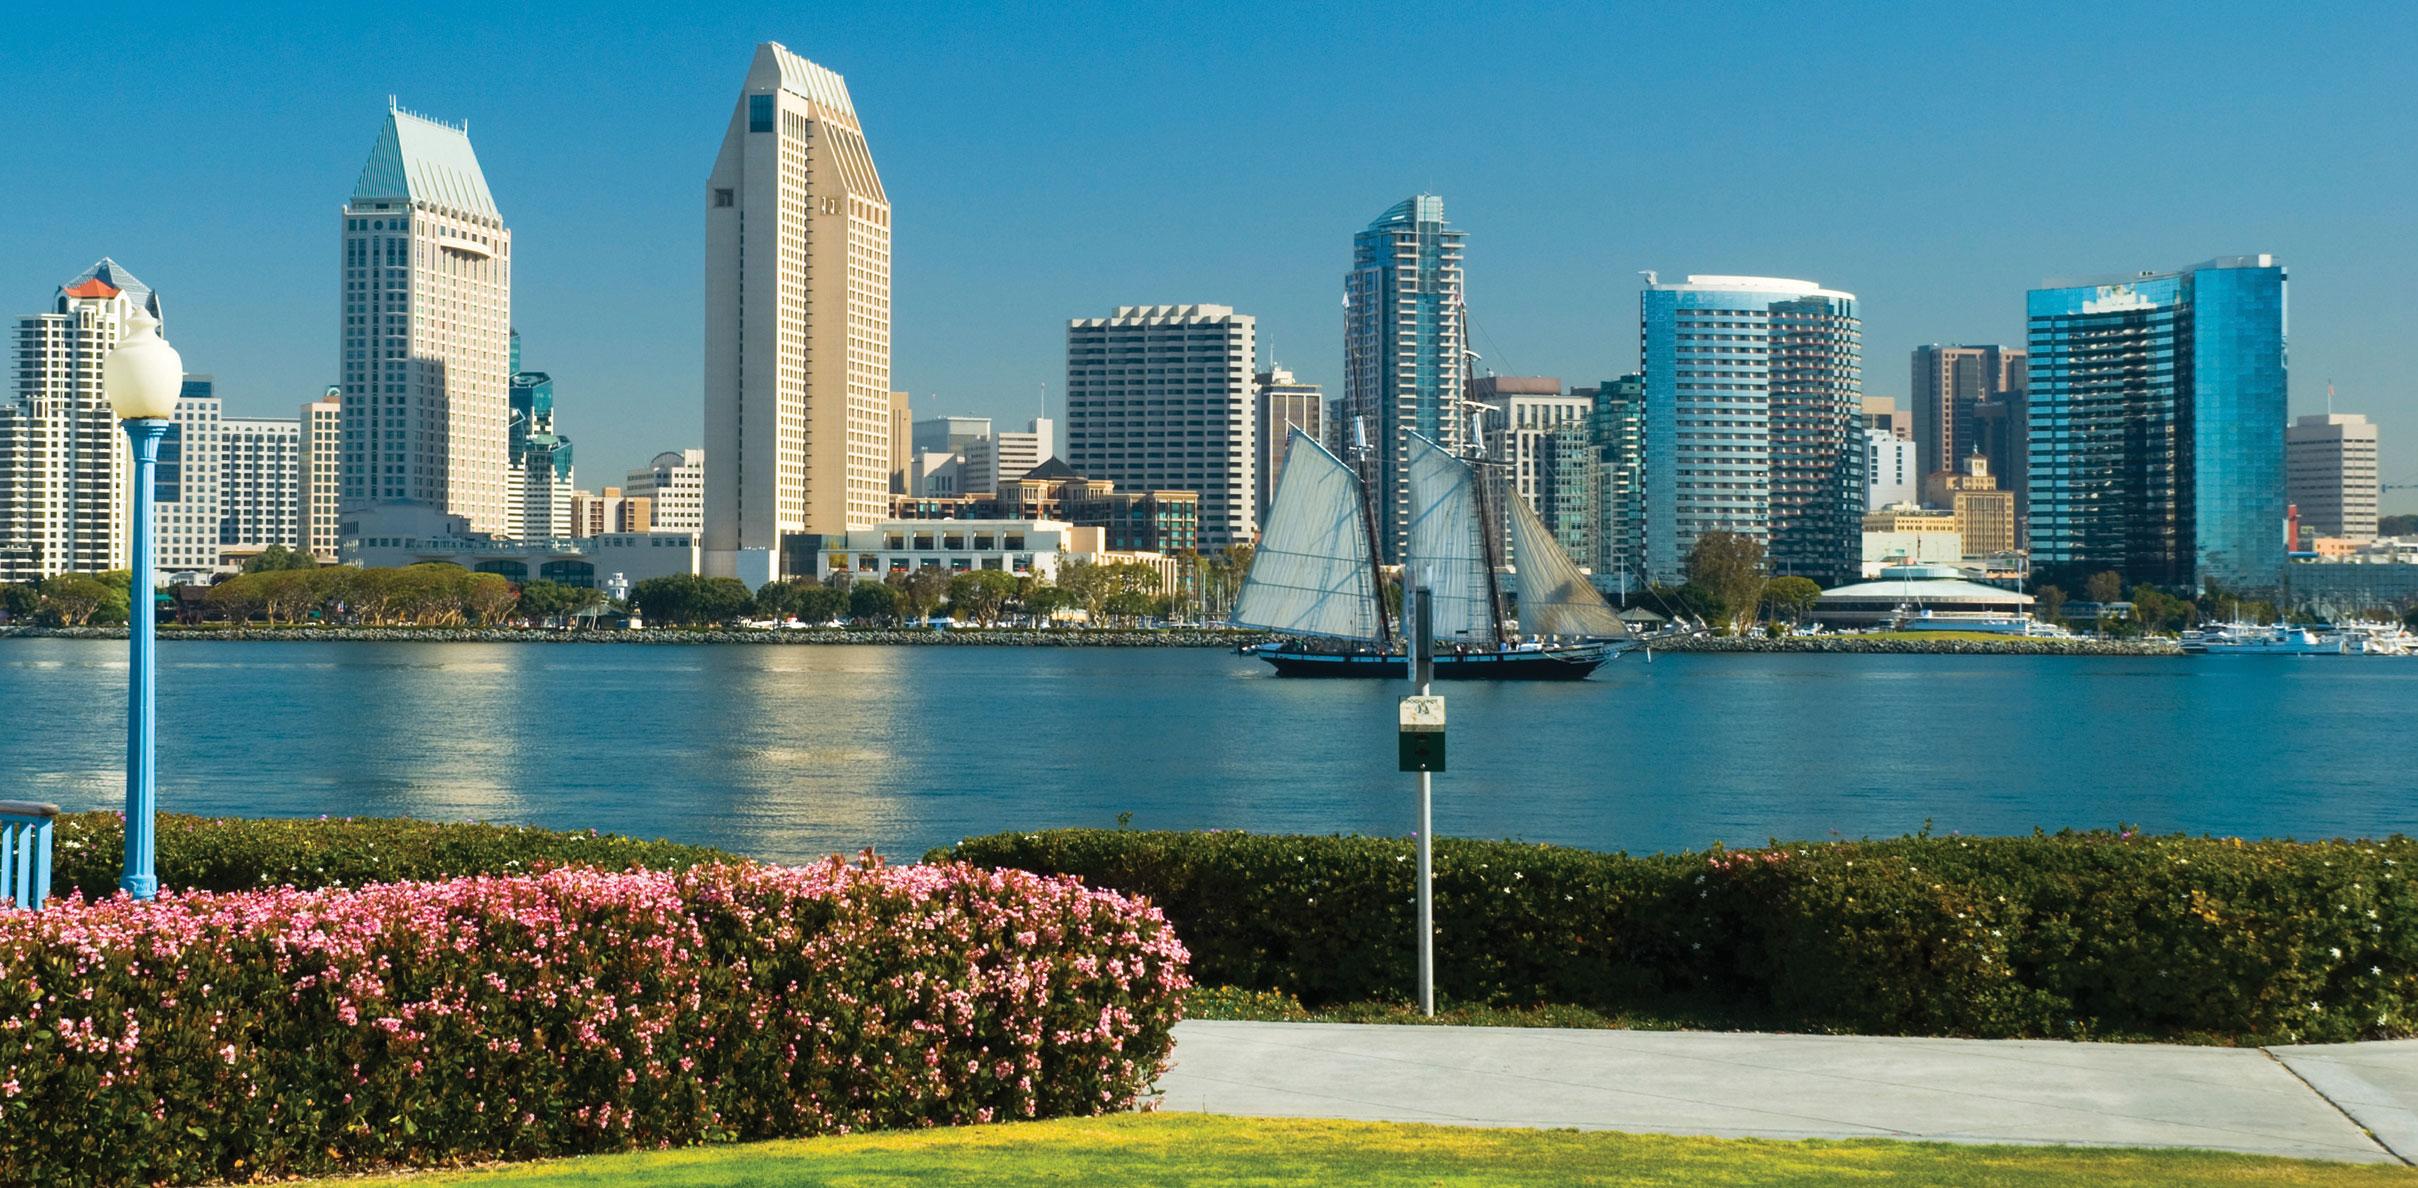 Chere Amie Yacht Charters | Cruise San Diego Bay